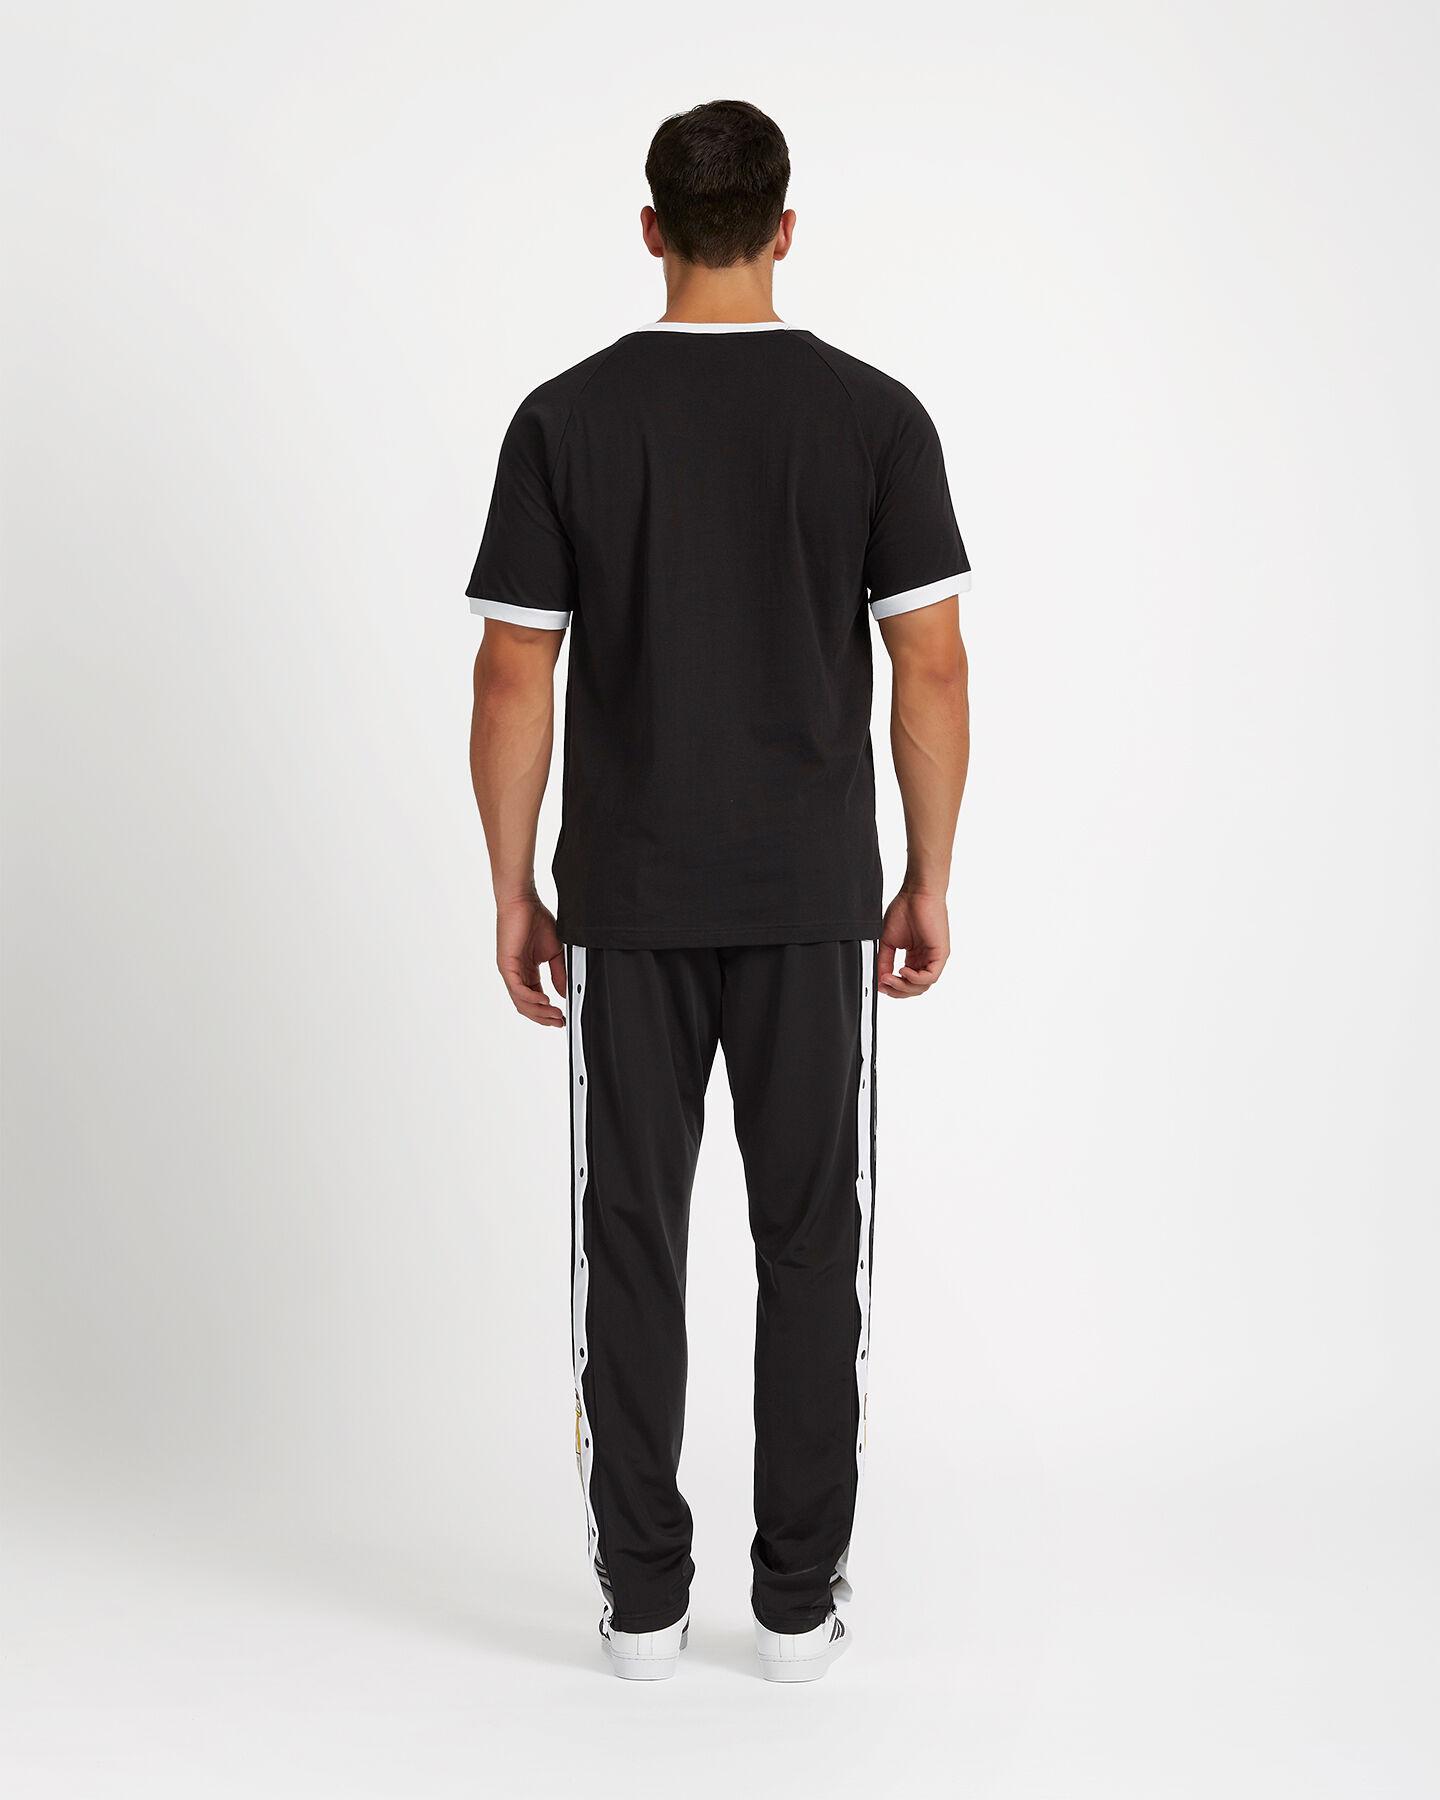 T-Shirt ADIDAS 3-STRIPES M S4043432 scatto 2